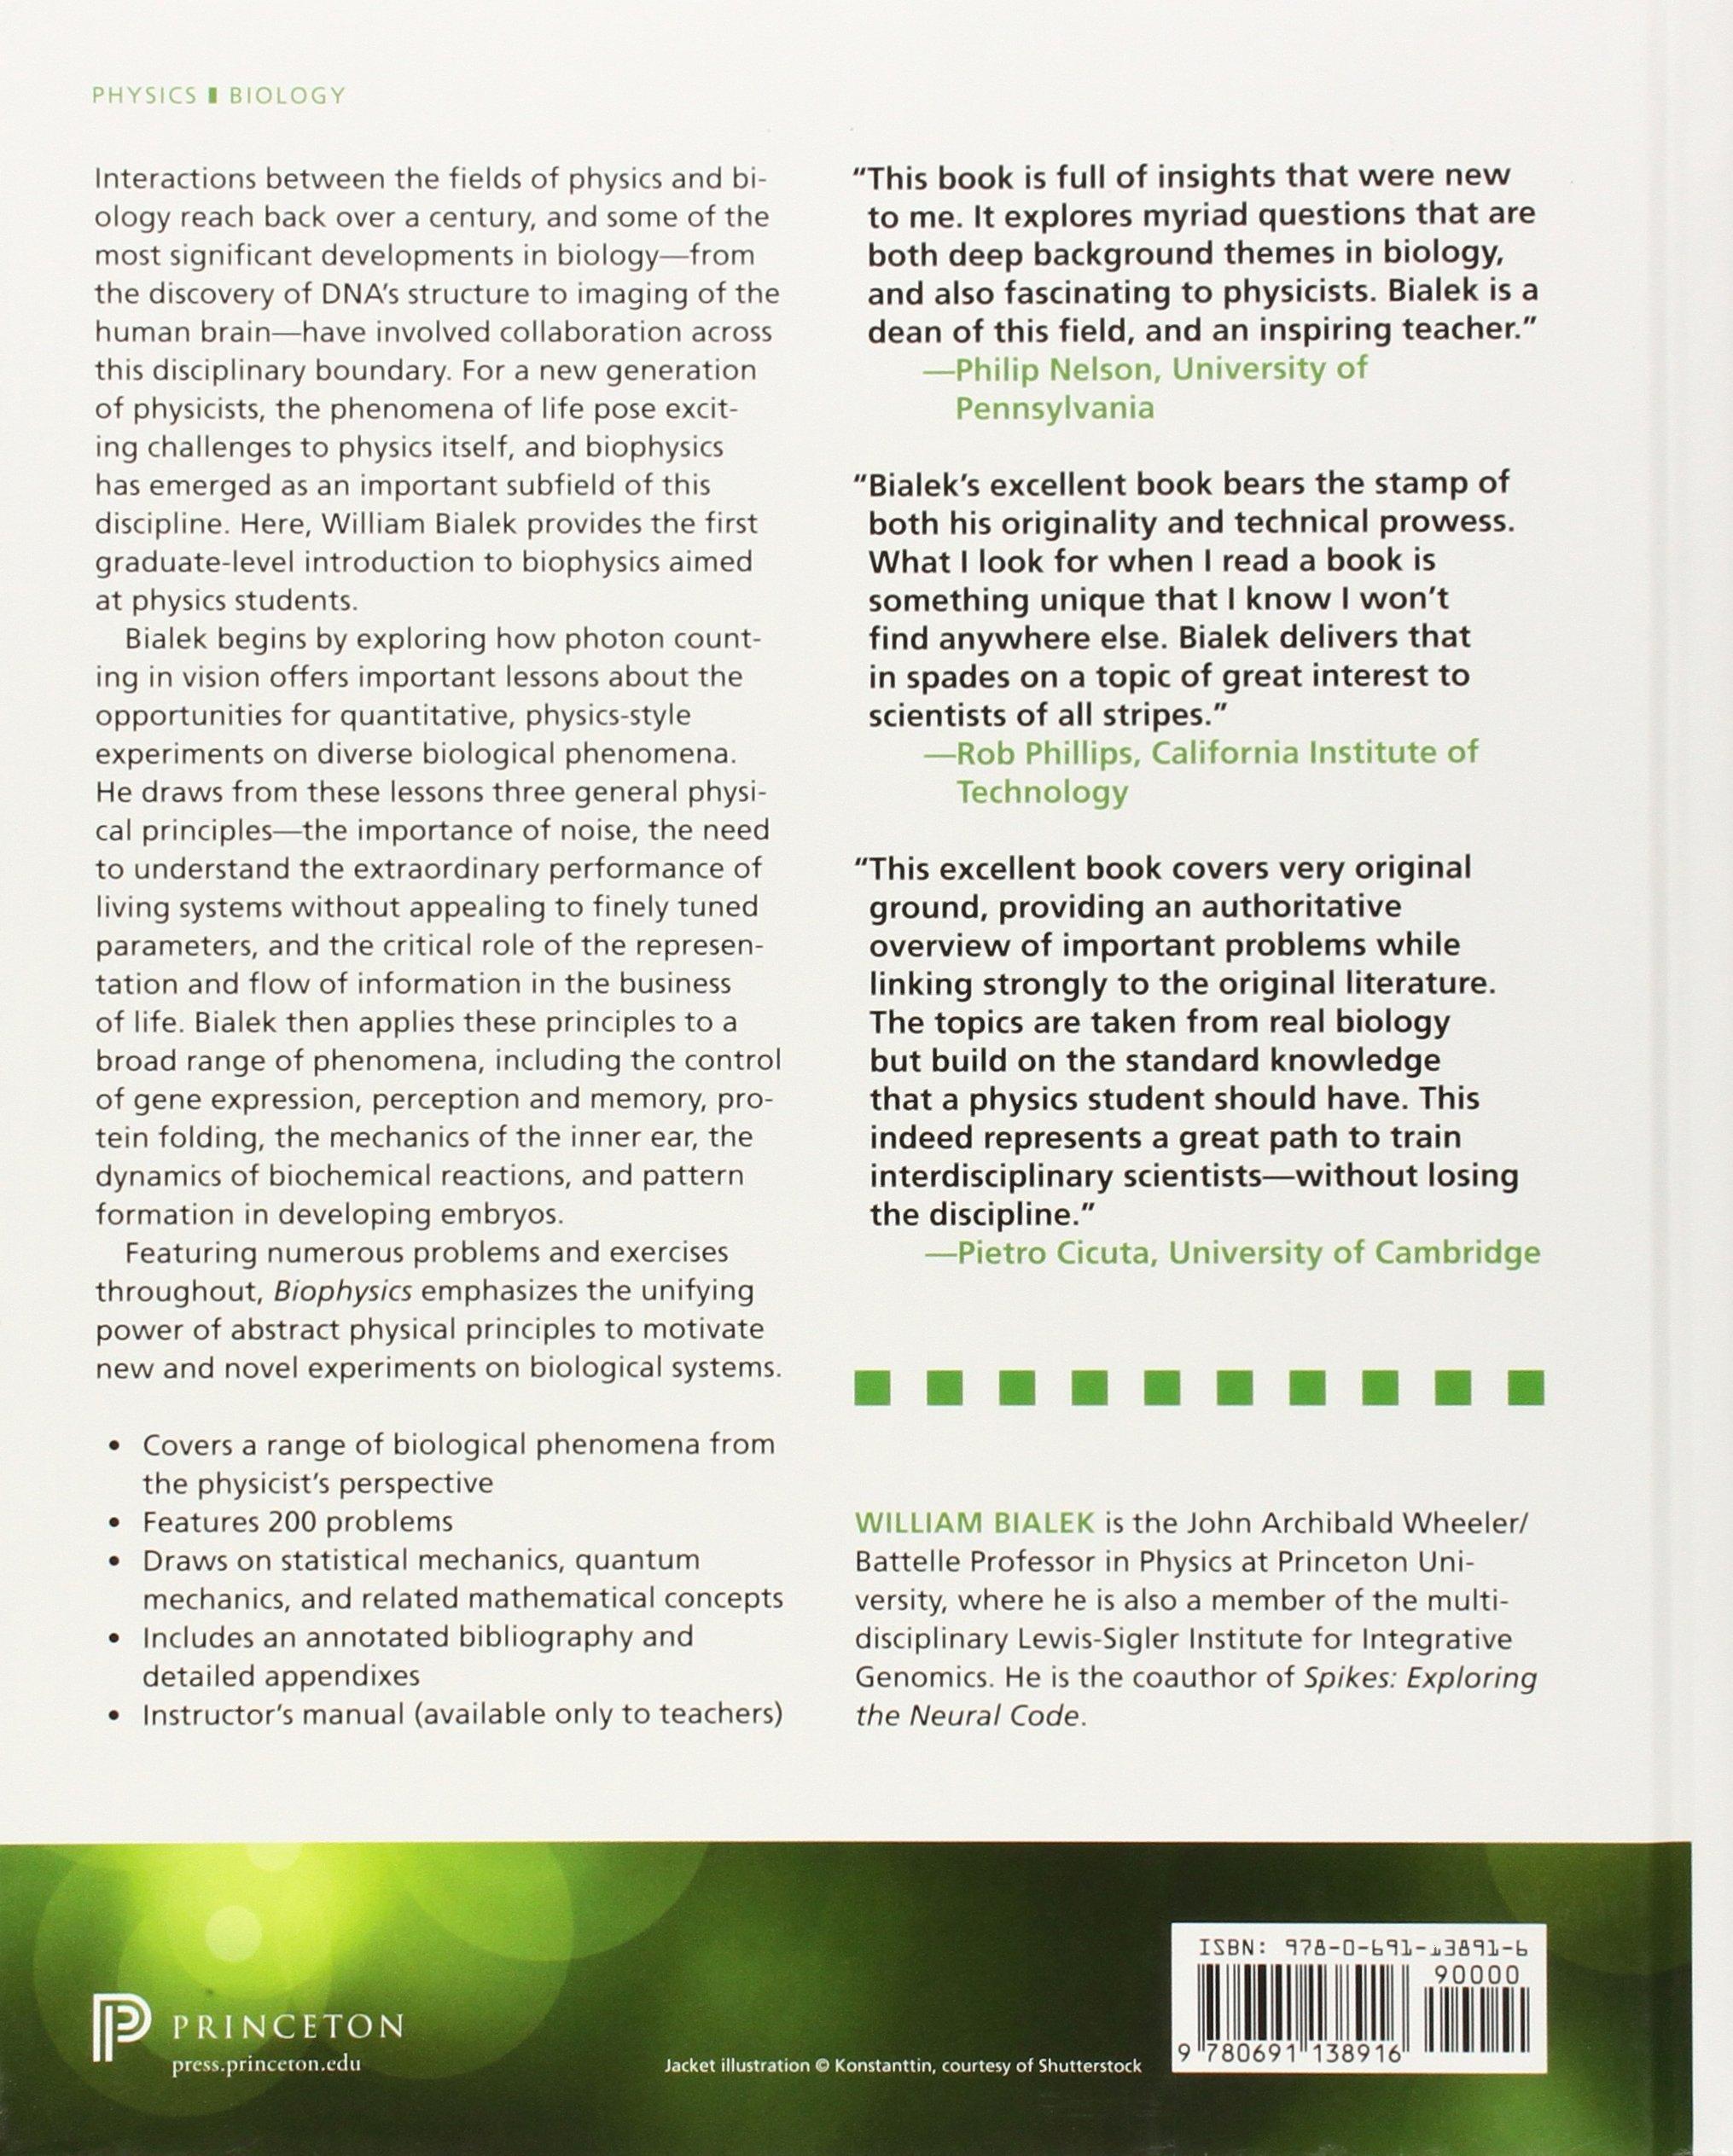 Biophysics searching for principles amazon william bialek biophysics searching for principles amazon william bialek 9780691138916 books fandeluxe Choice Image